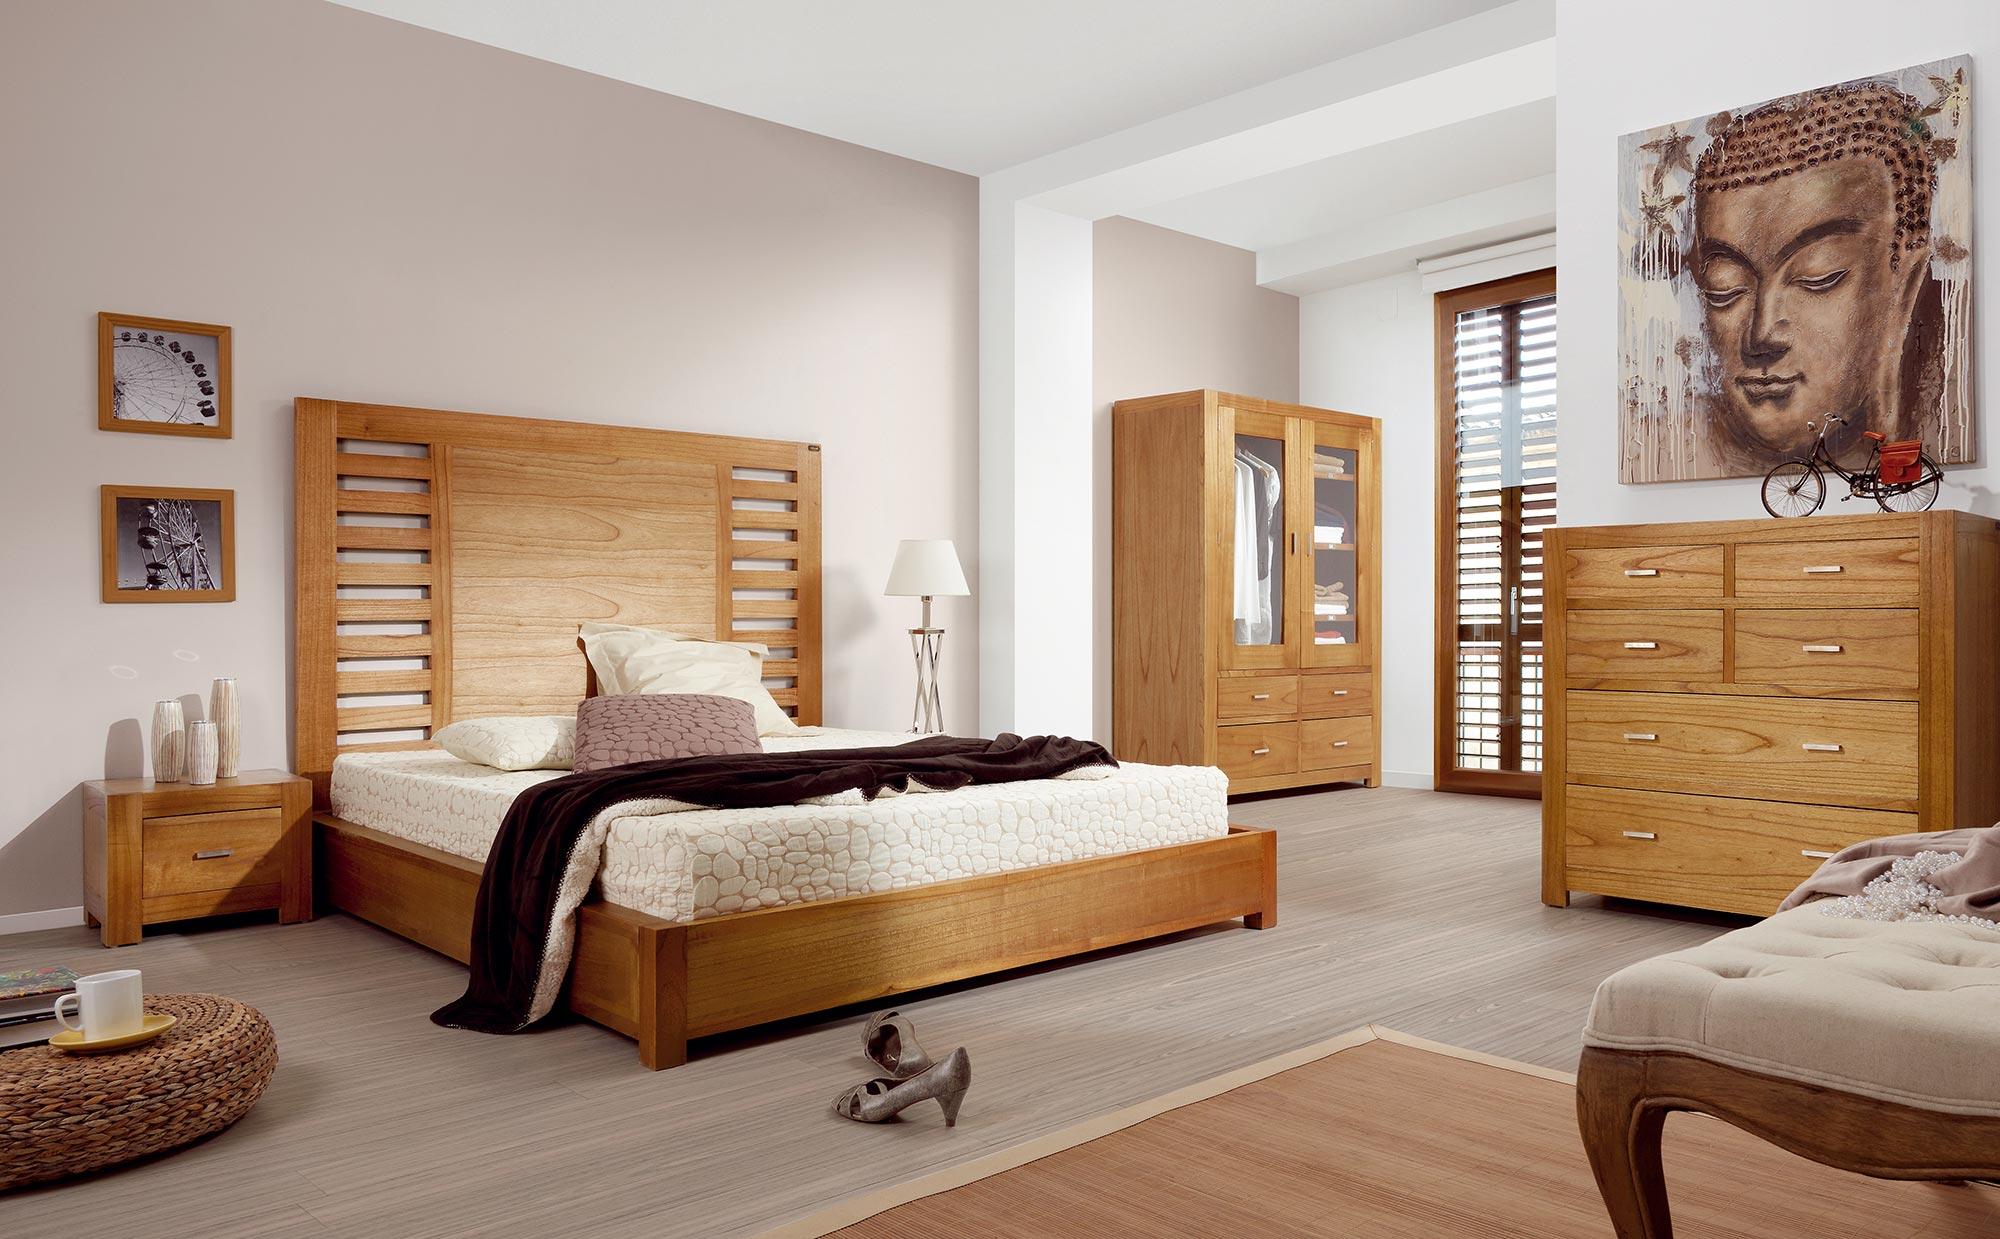 meuble chaussures en bois naturel 4 tiroirs 110 30 80. Black Bedroom Furniture Sets. Home Design Ideas